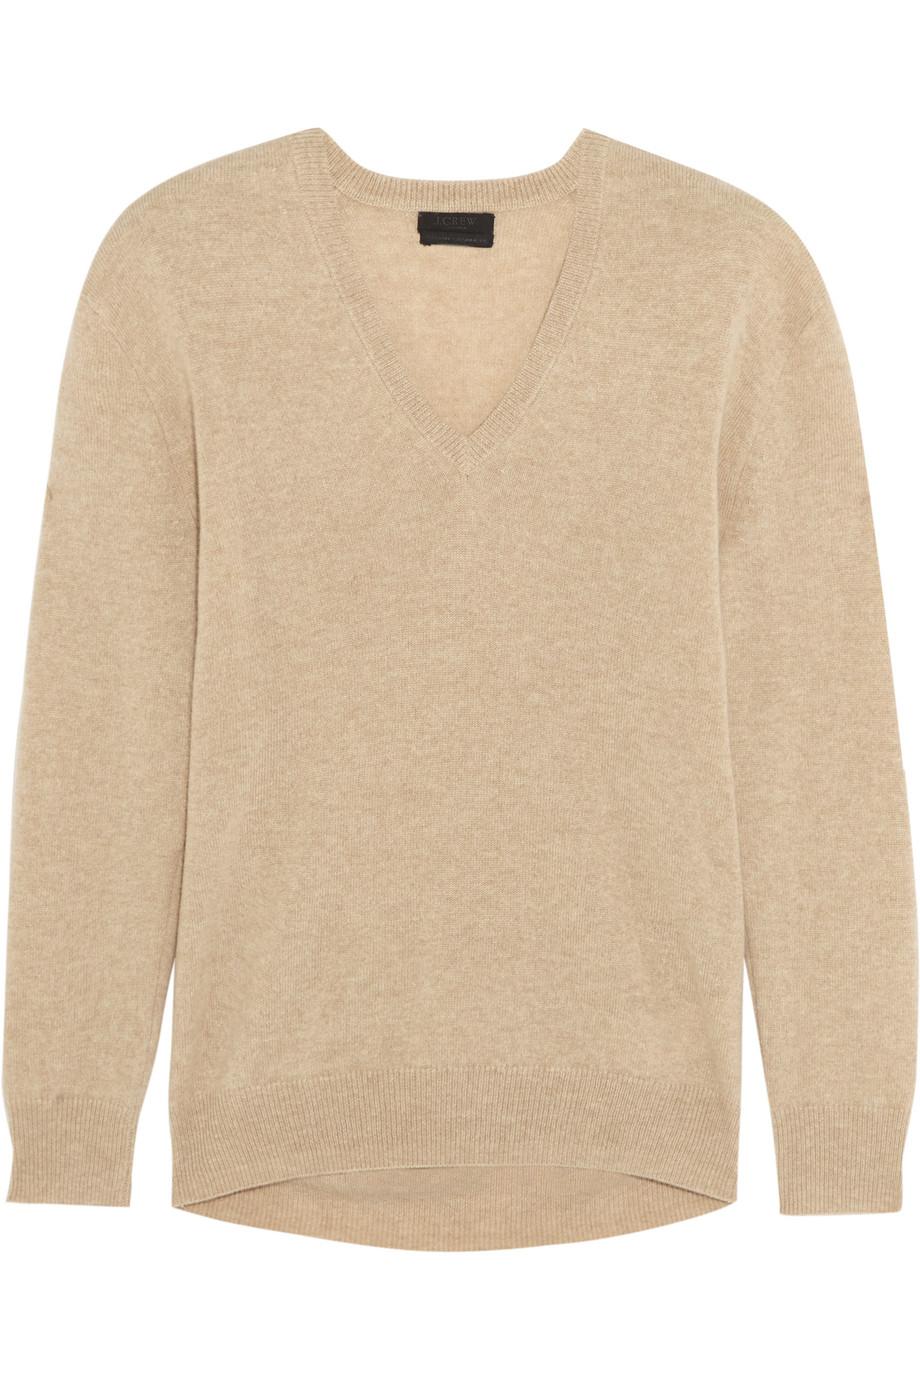 J.Crew Cashmere Sweater, Beige, Women's, Size: M